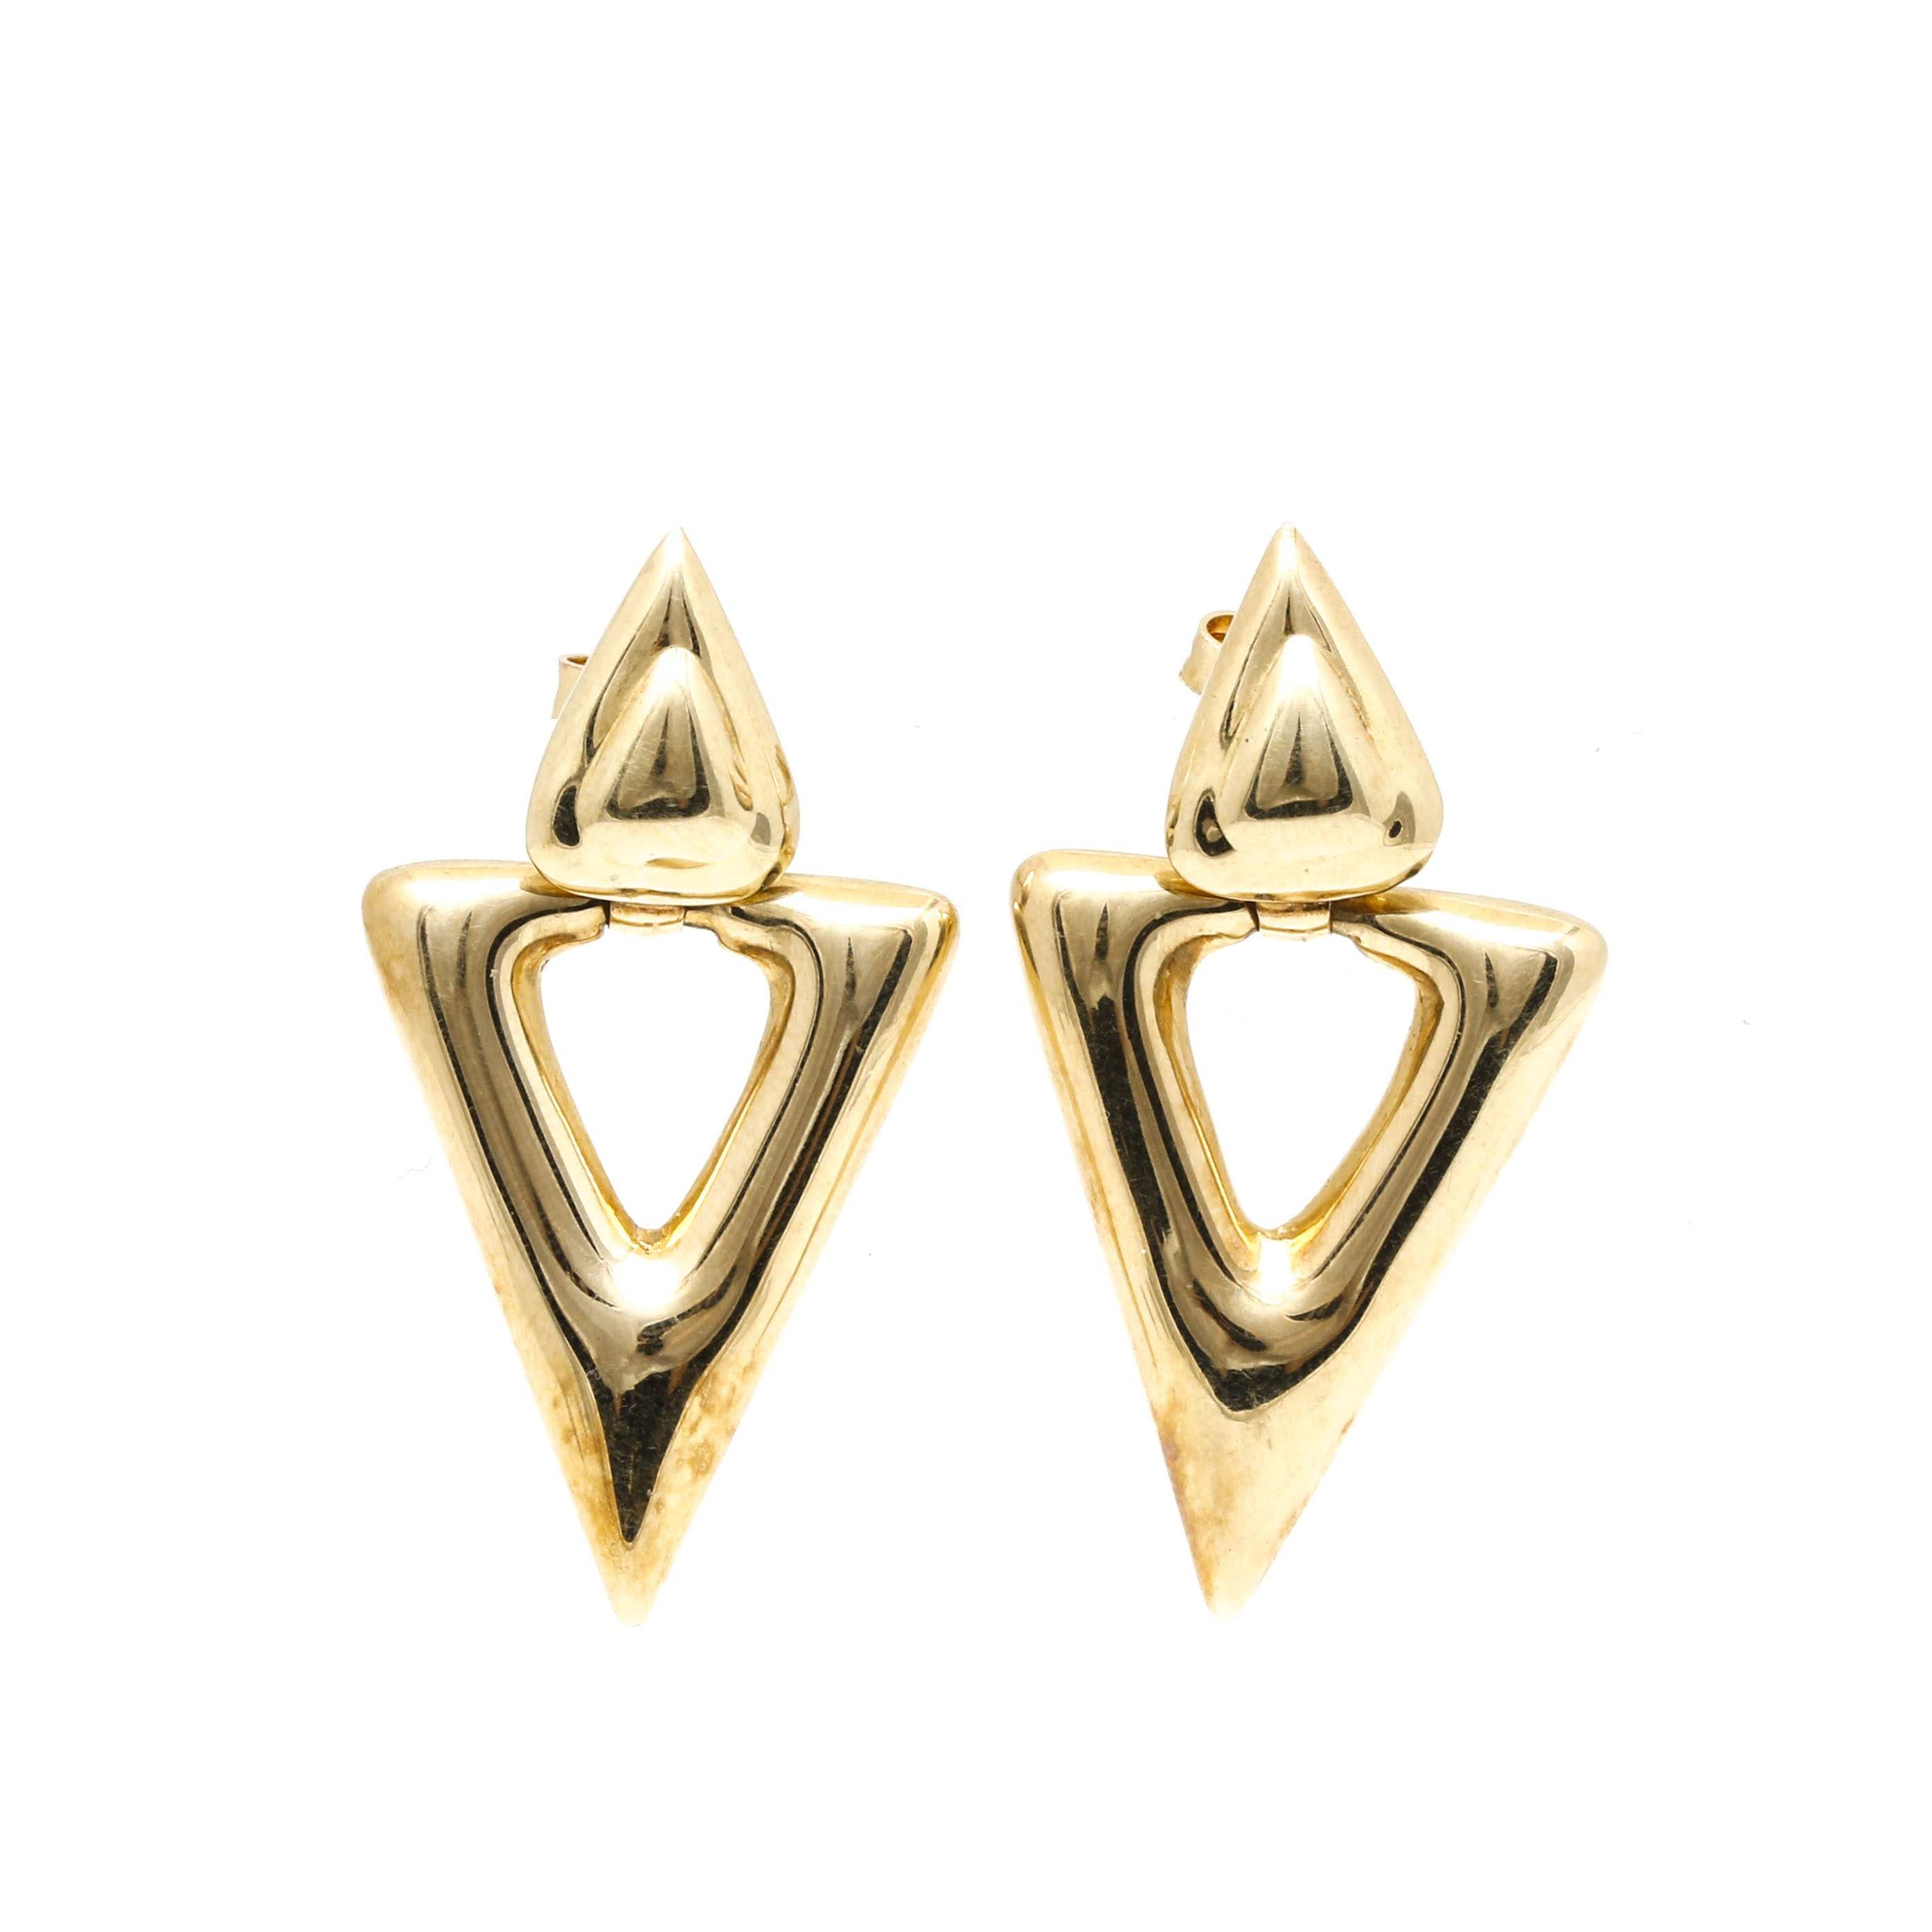 14K Yellow Gold Post Back Dangling Earrings